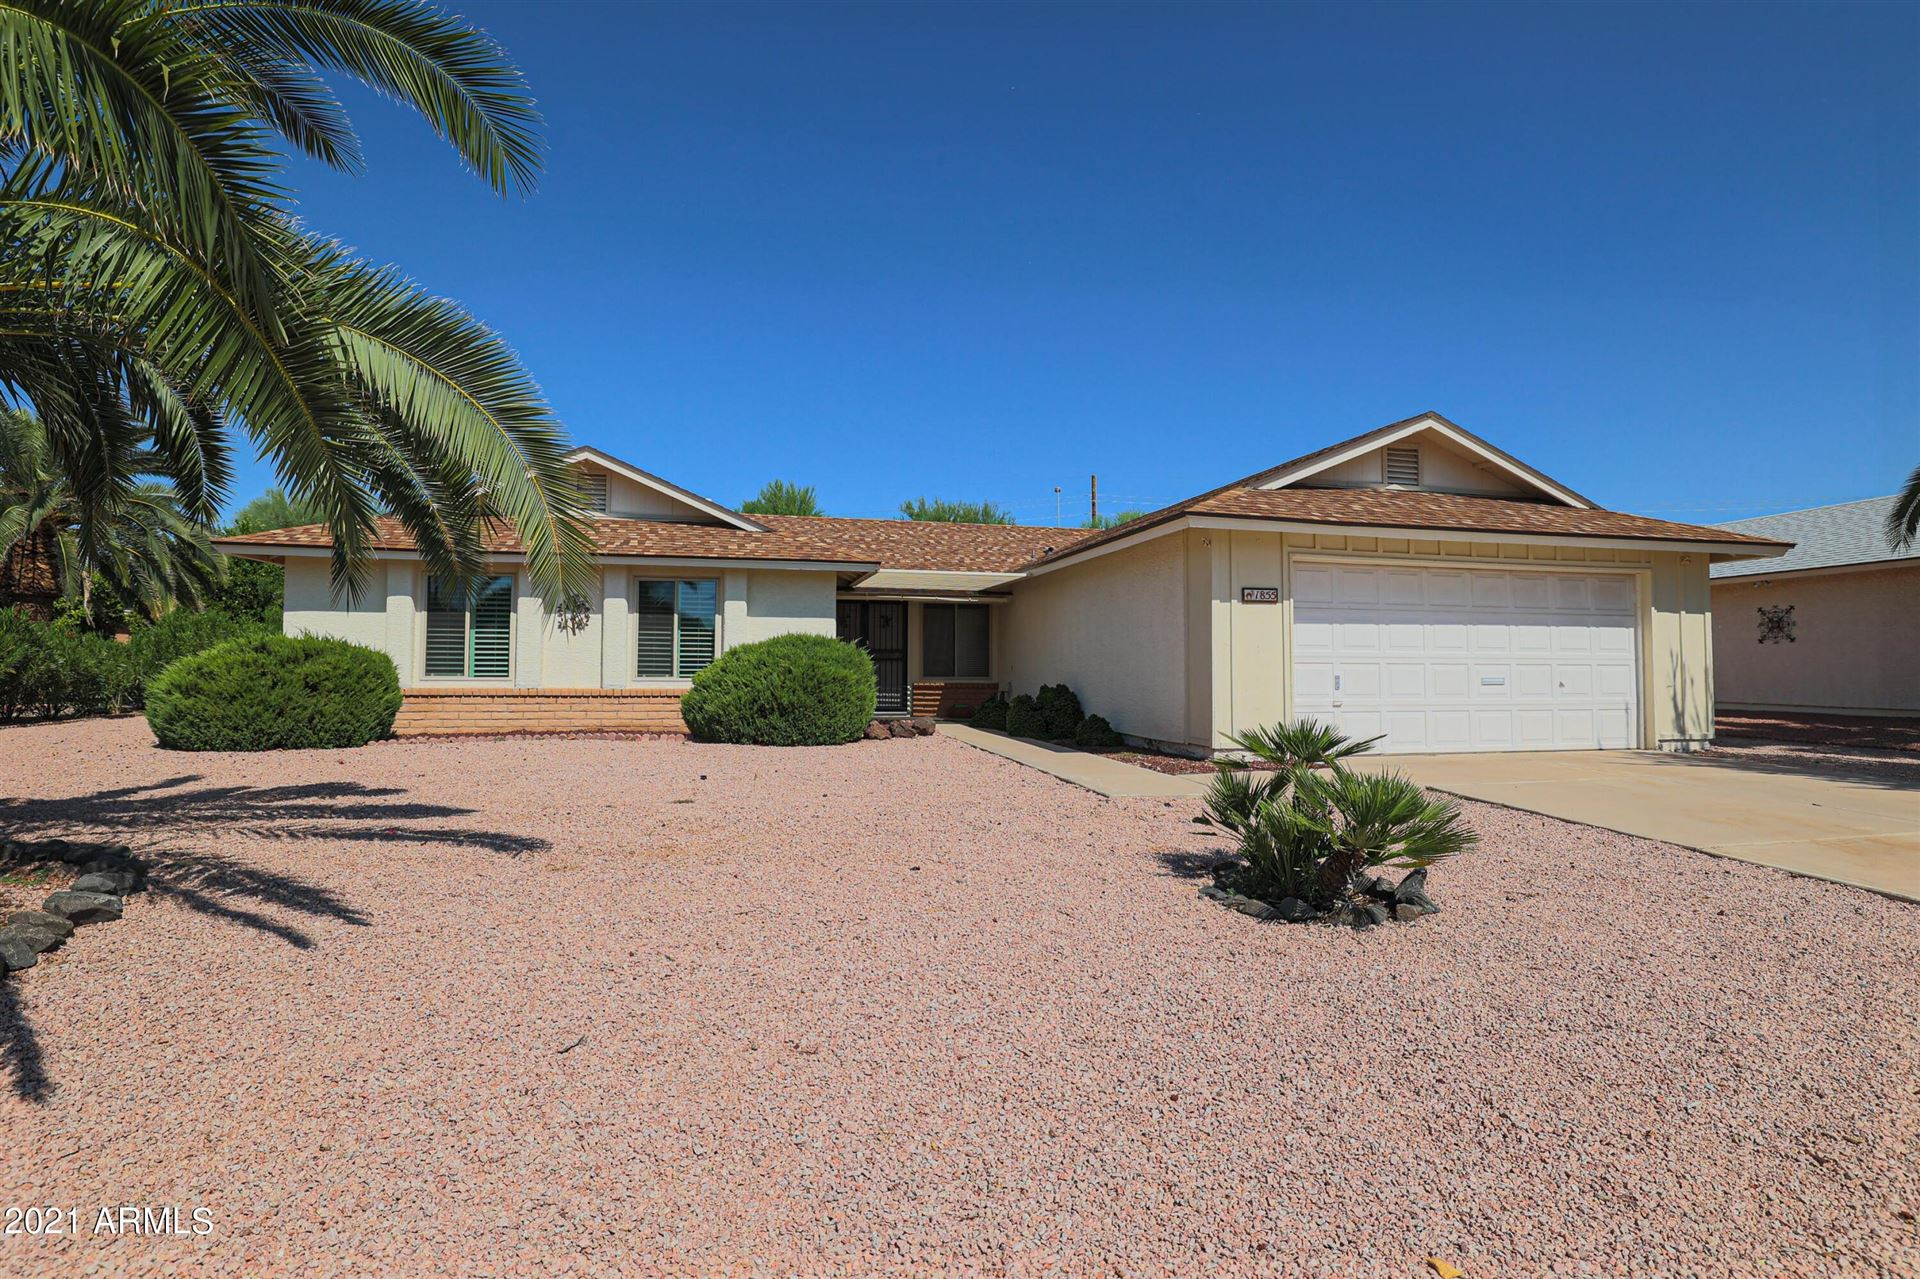 Photo of 1855 LEISURE WORLD --, Mesa, AZ 85206 (MLS # 6296682)